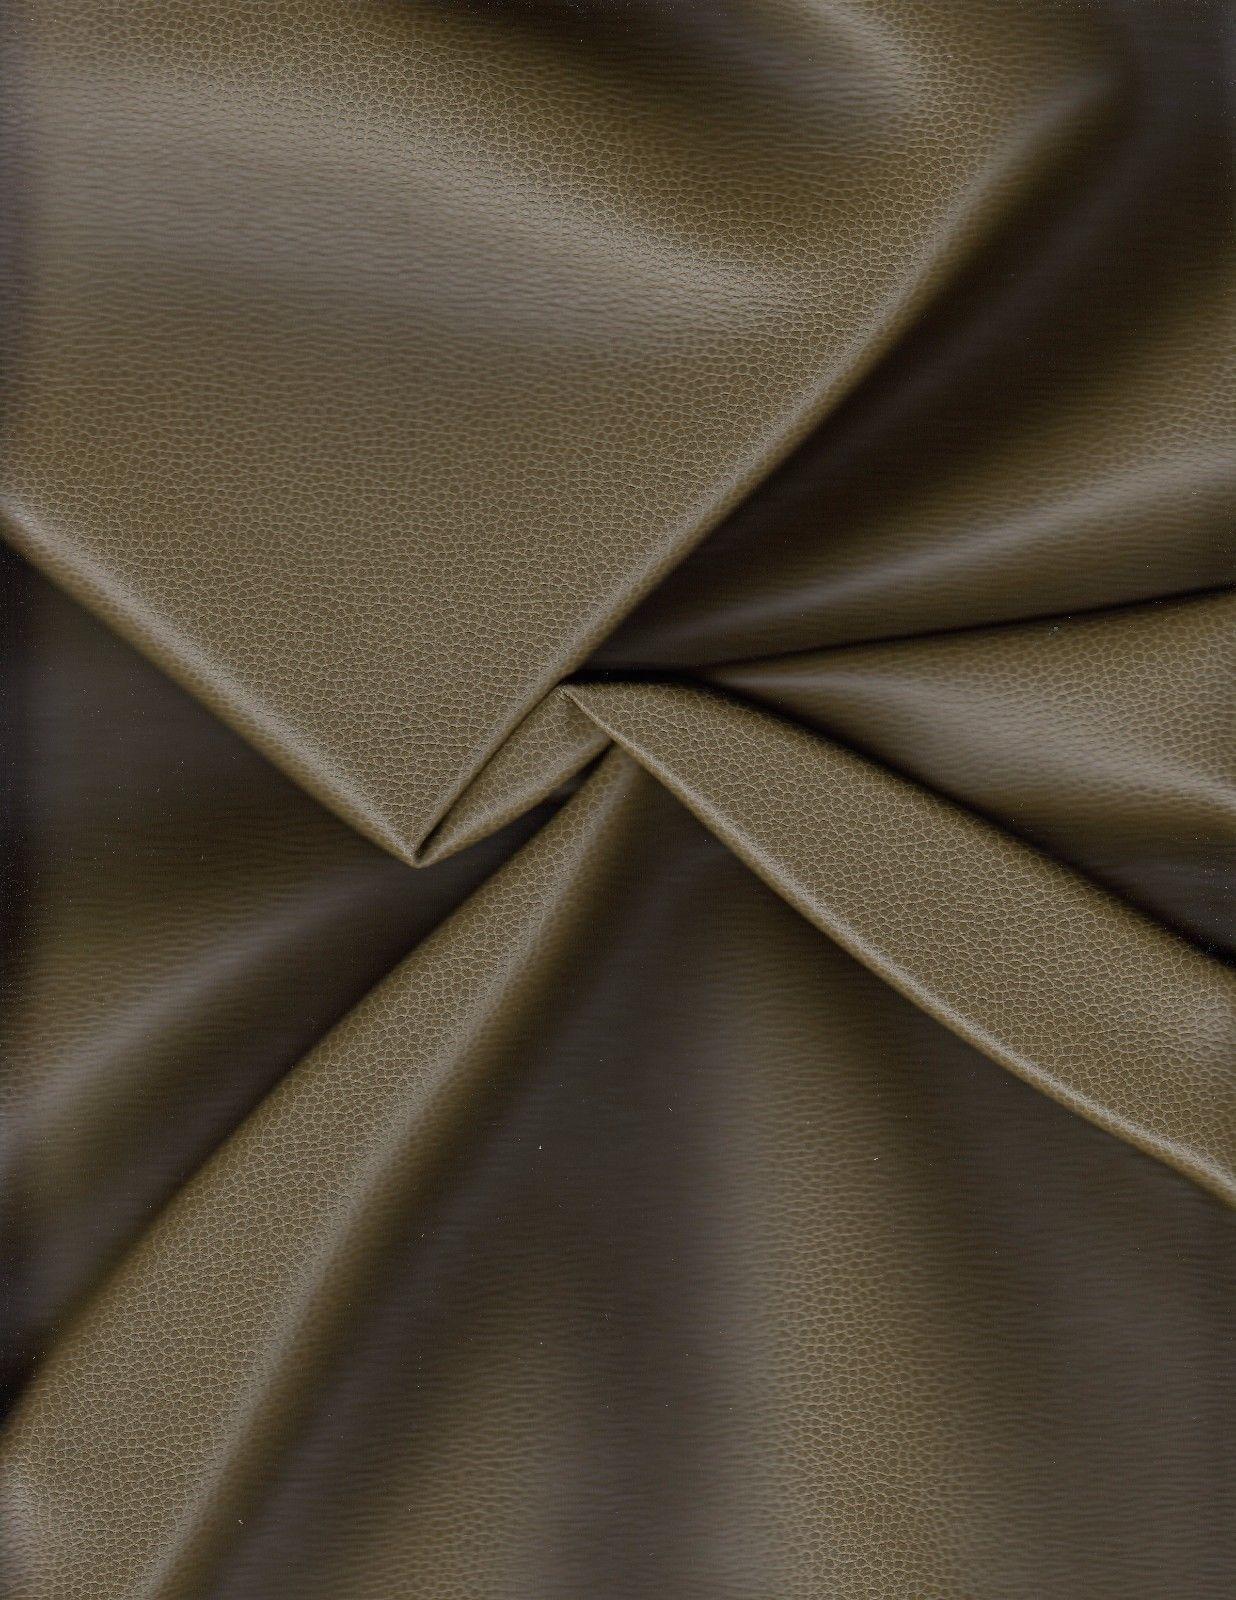 Ultrafabrics Upholstery Faux Leather 363-4514 Promessa Moss Green 3.125 yds T-25